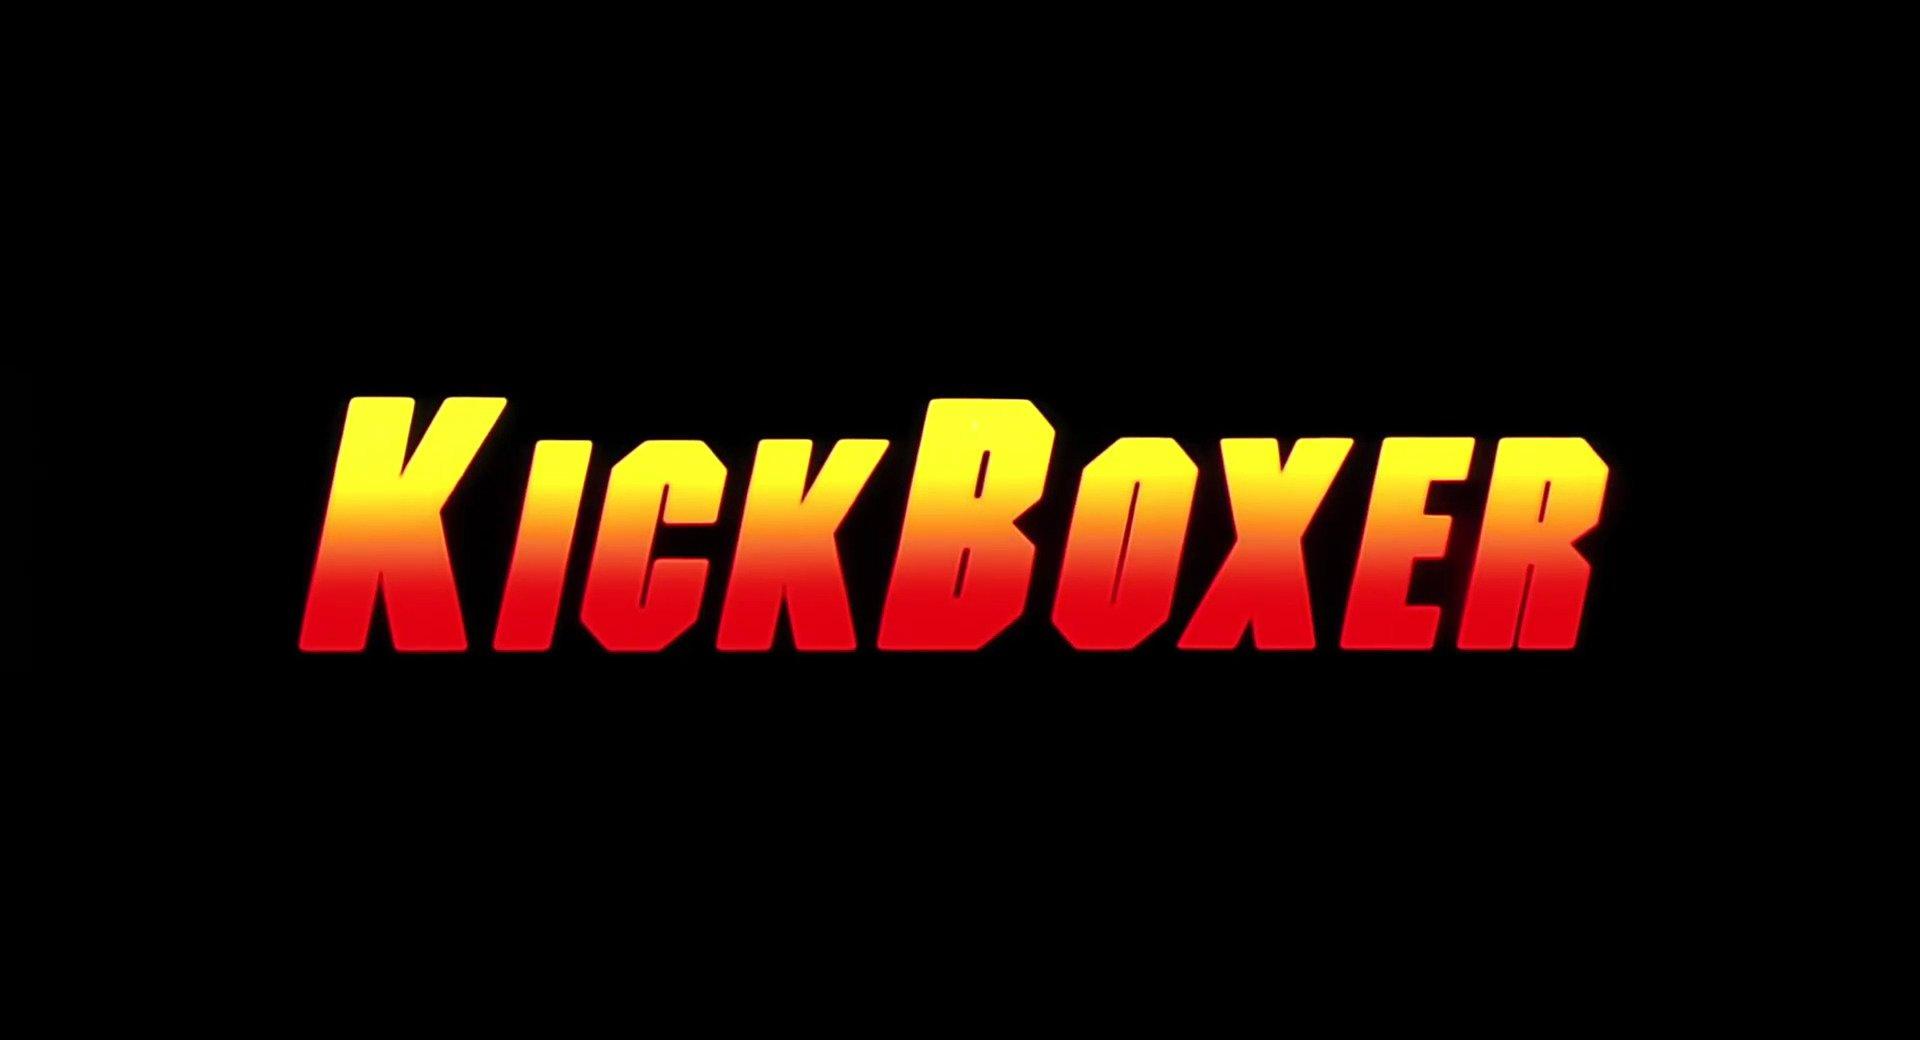 KICKBOXER martial arts action sports thriller fighting wallpaper 1920x1040